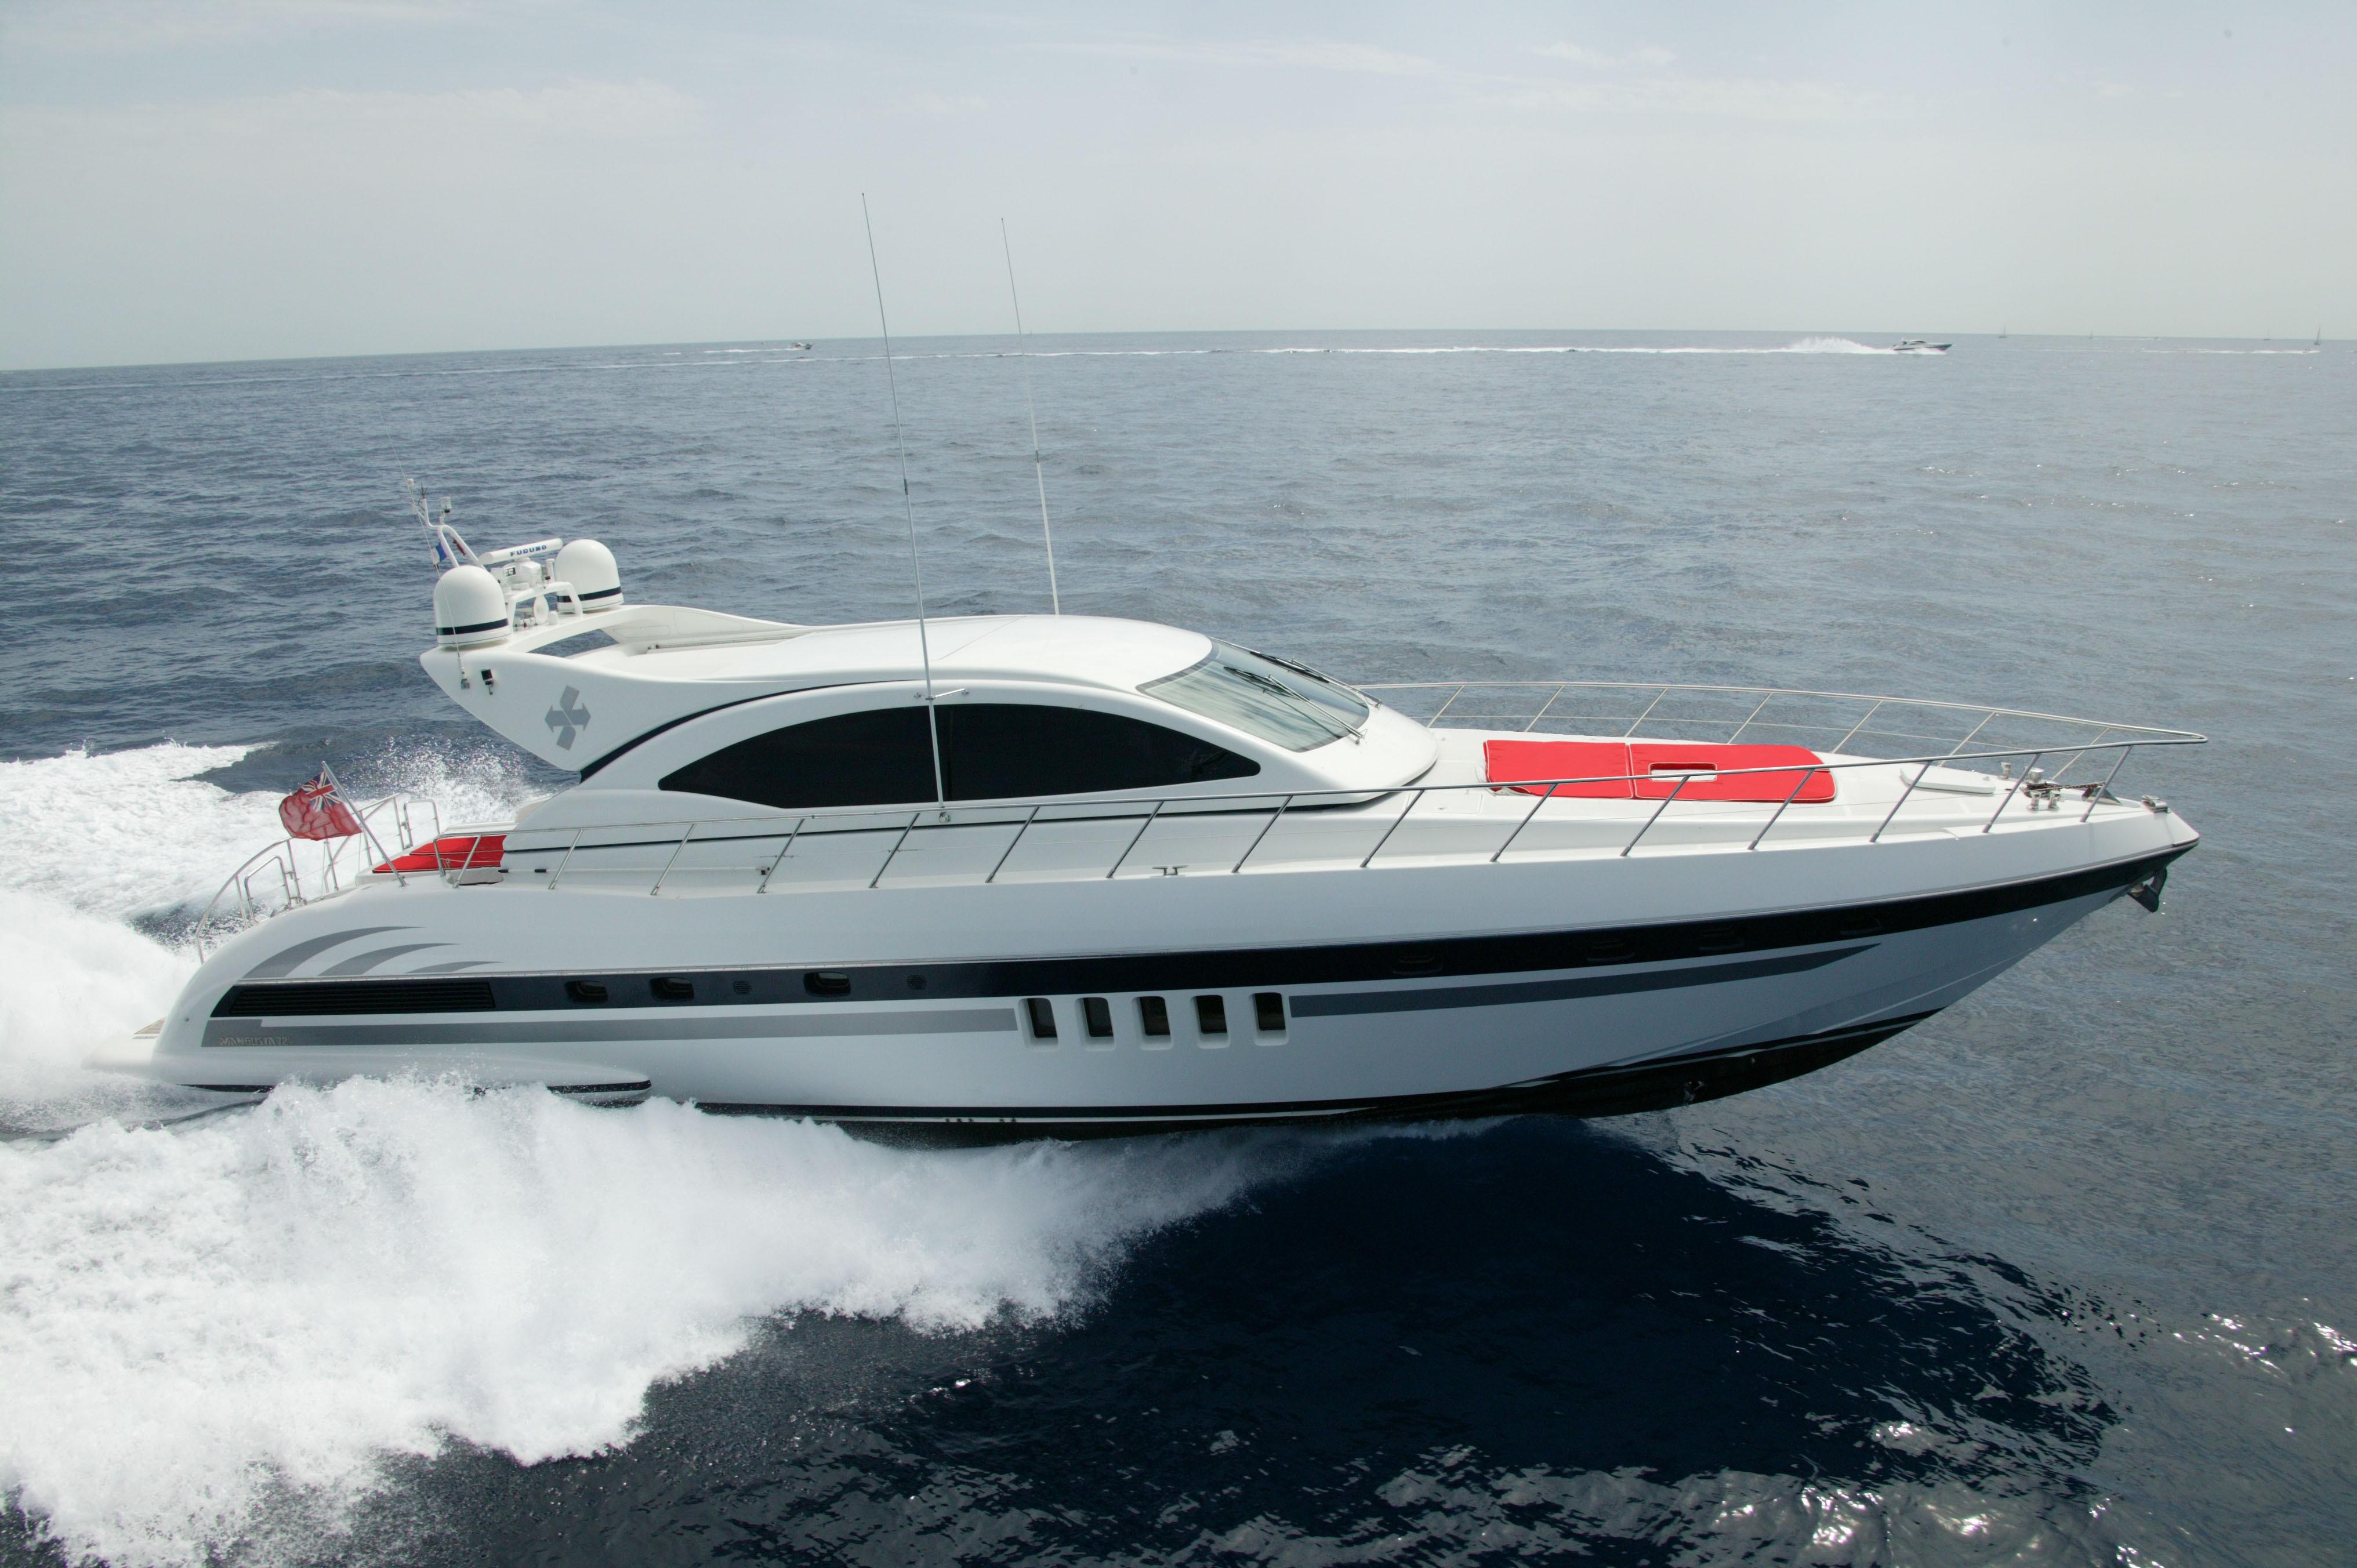 The 22m Yacht LORELEI